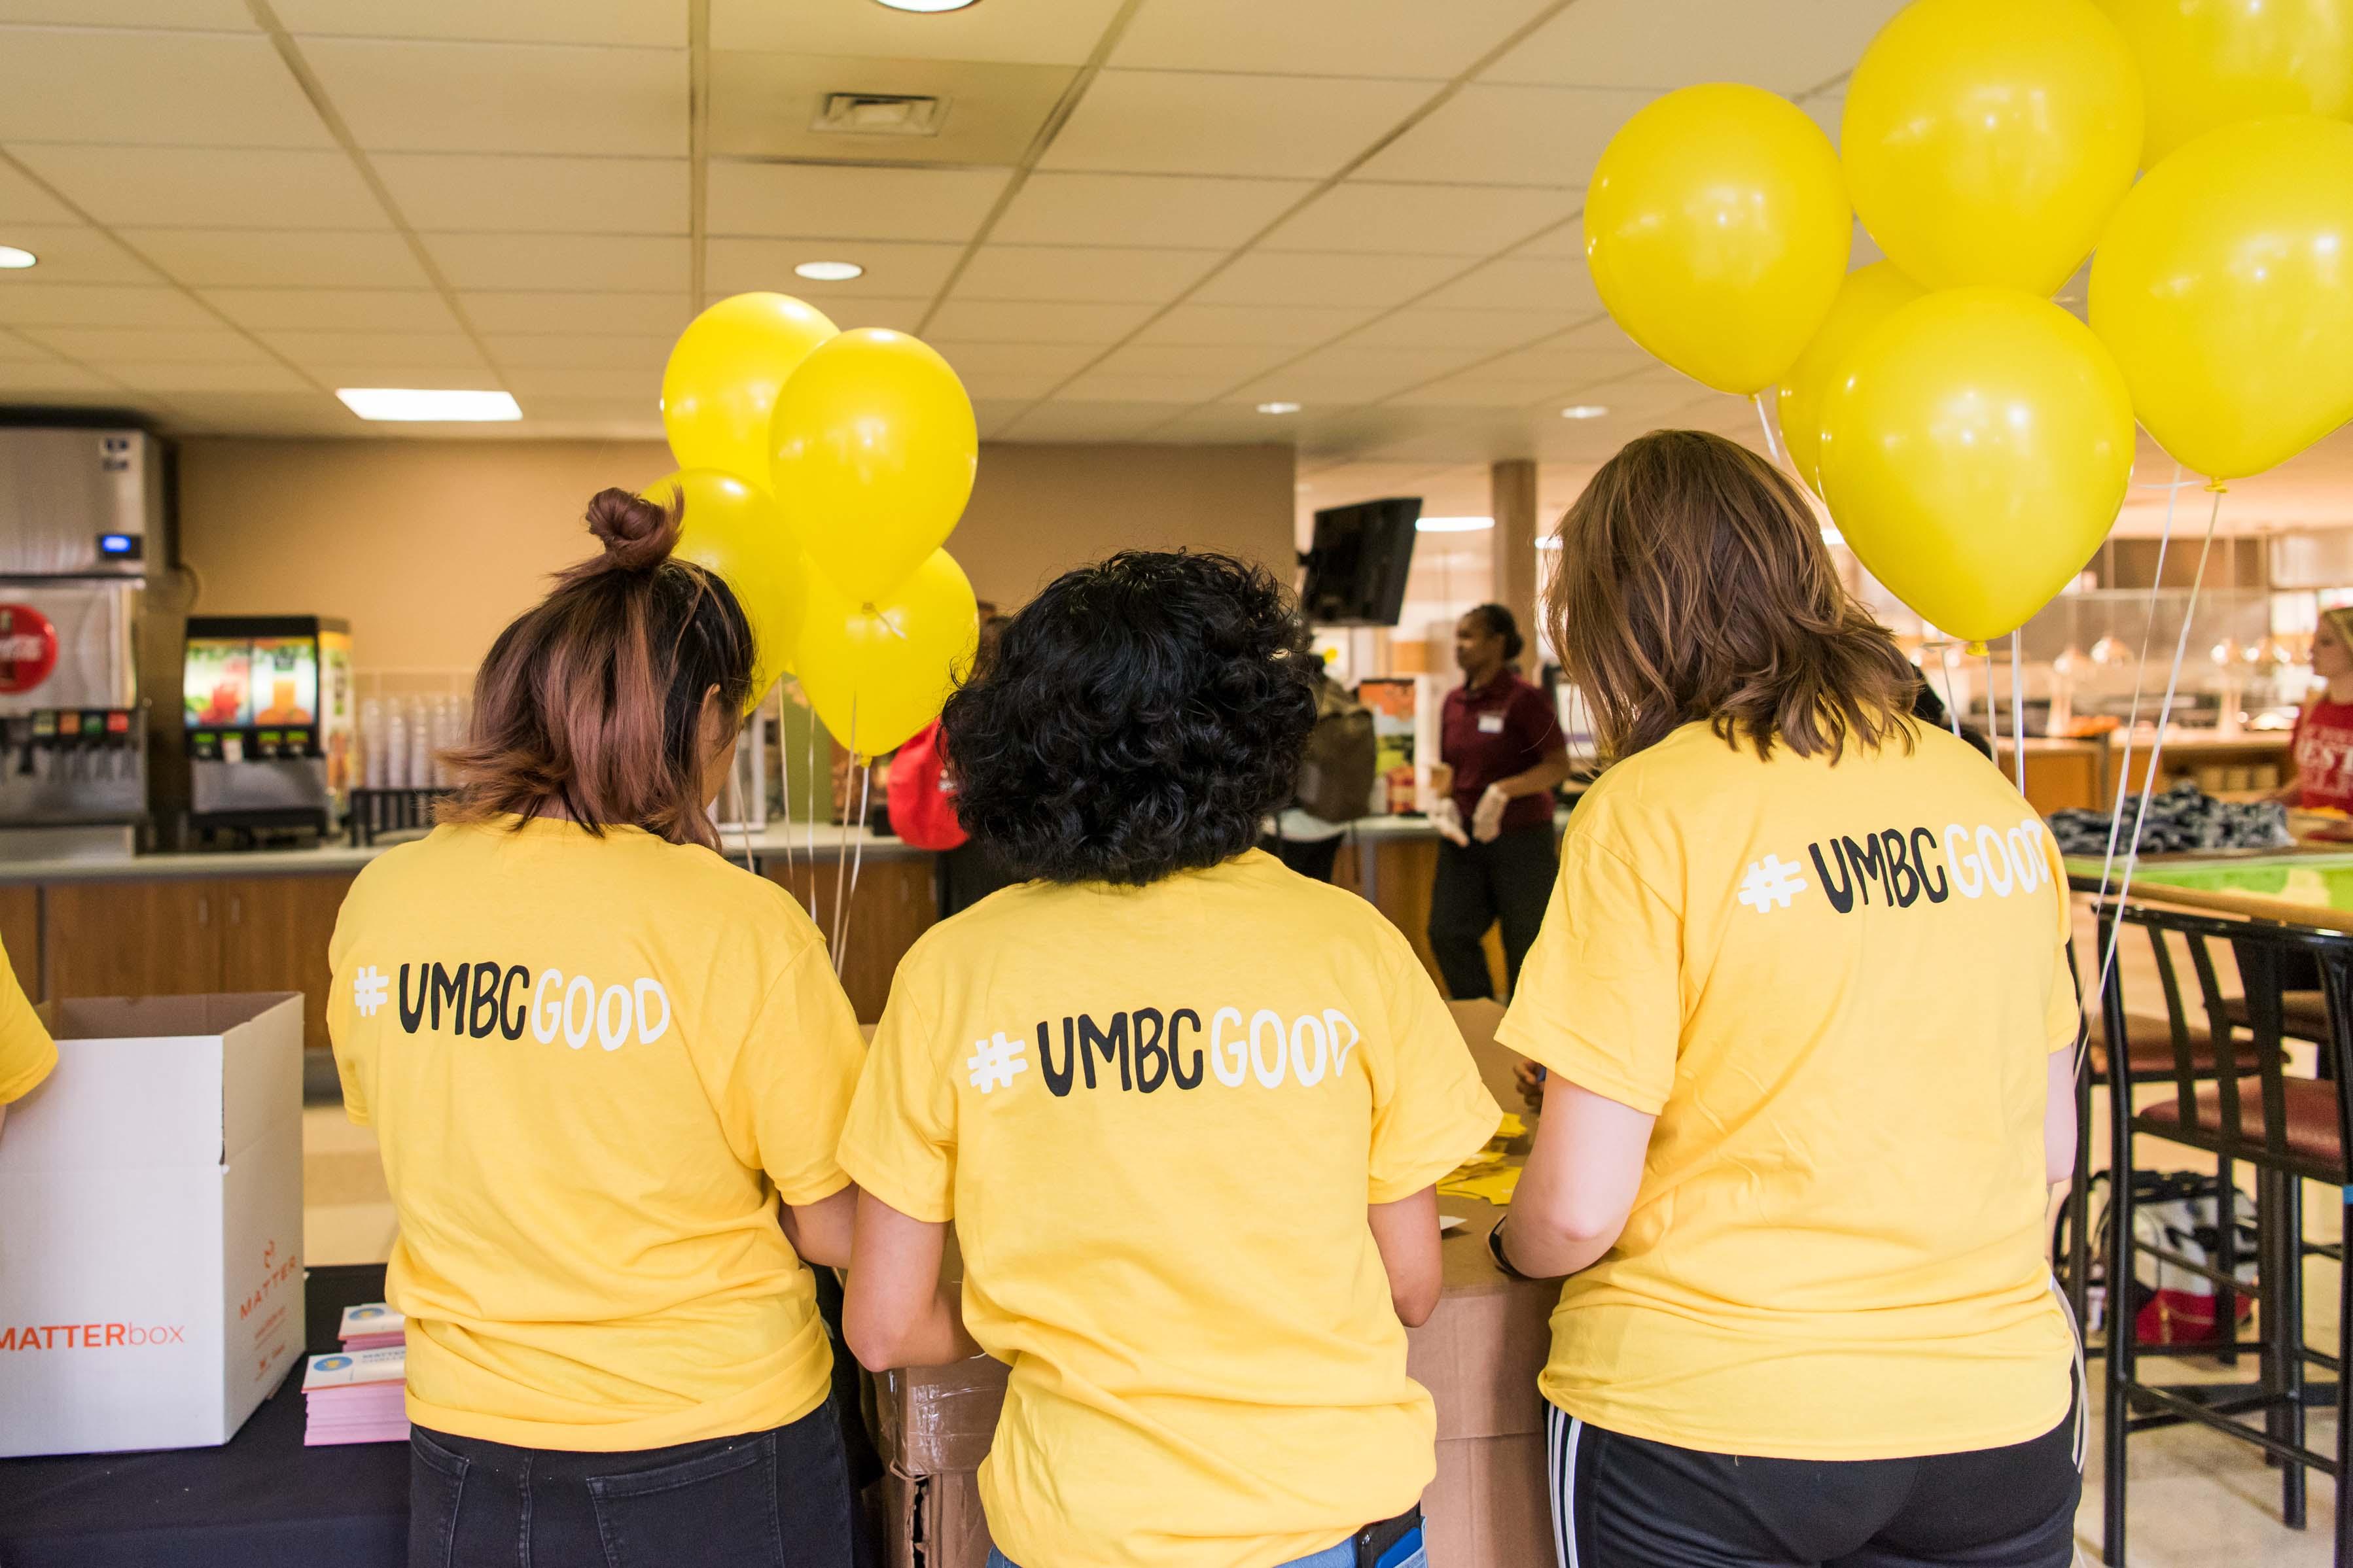 Three people with #UMBCGOOD shirts